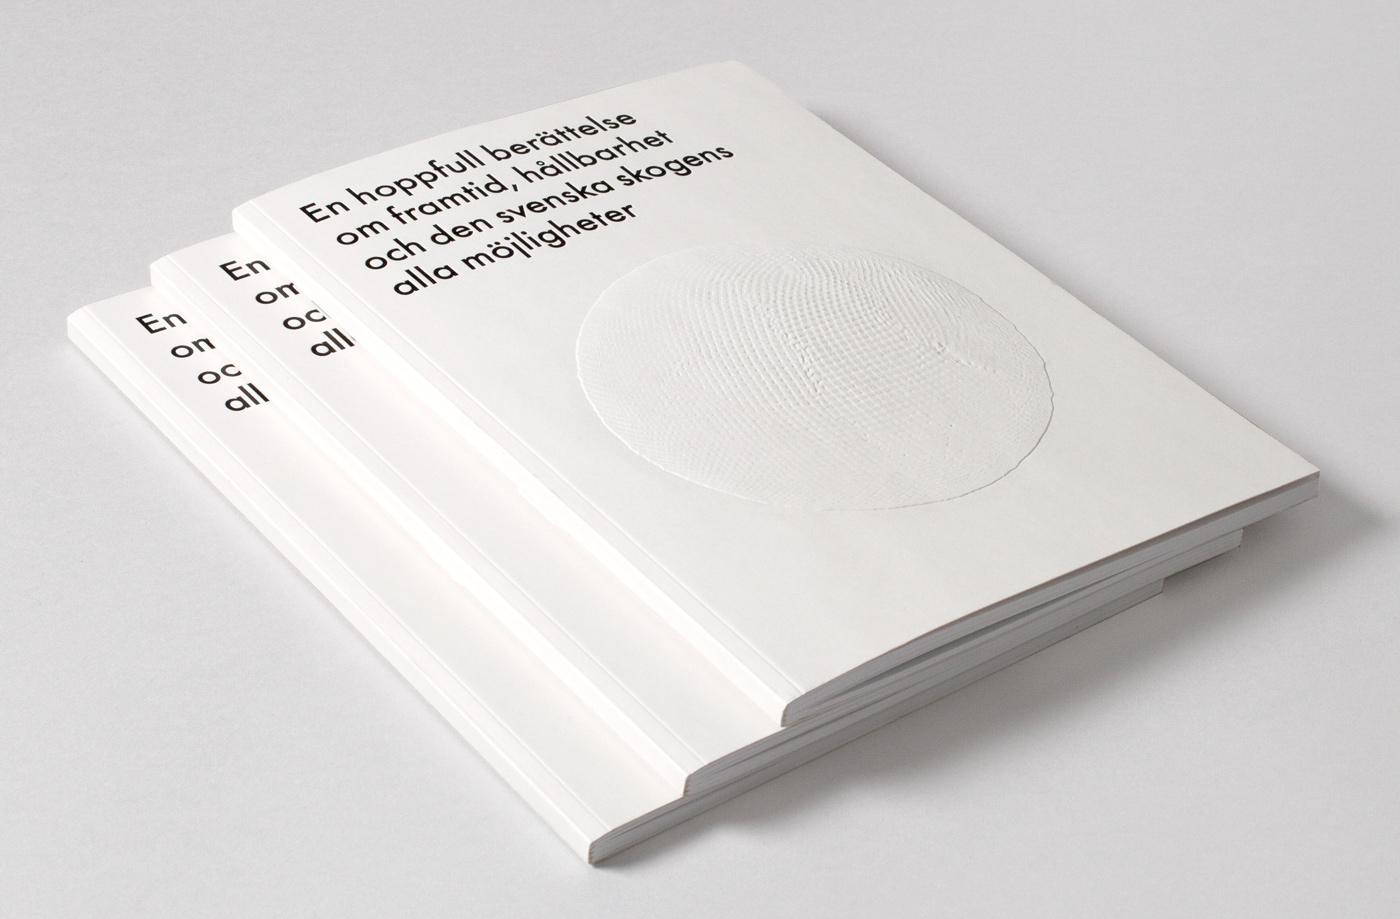 03-Skogsindustrierna-The-Swedish-Forest-Industries-Federation-Identity-Print-BVD-BPO